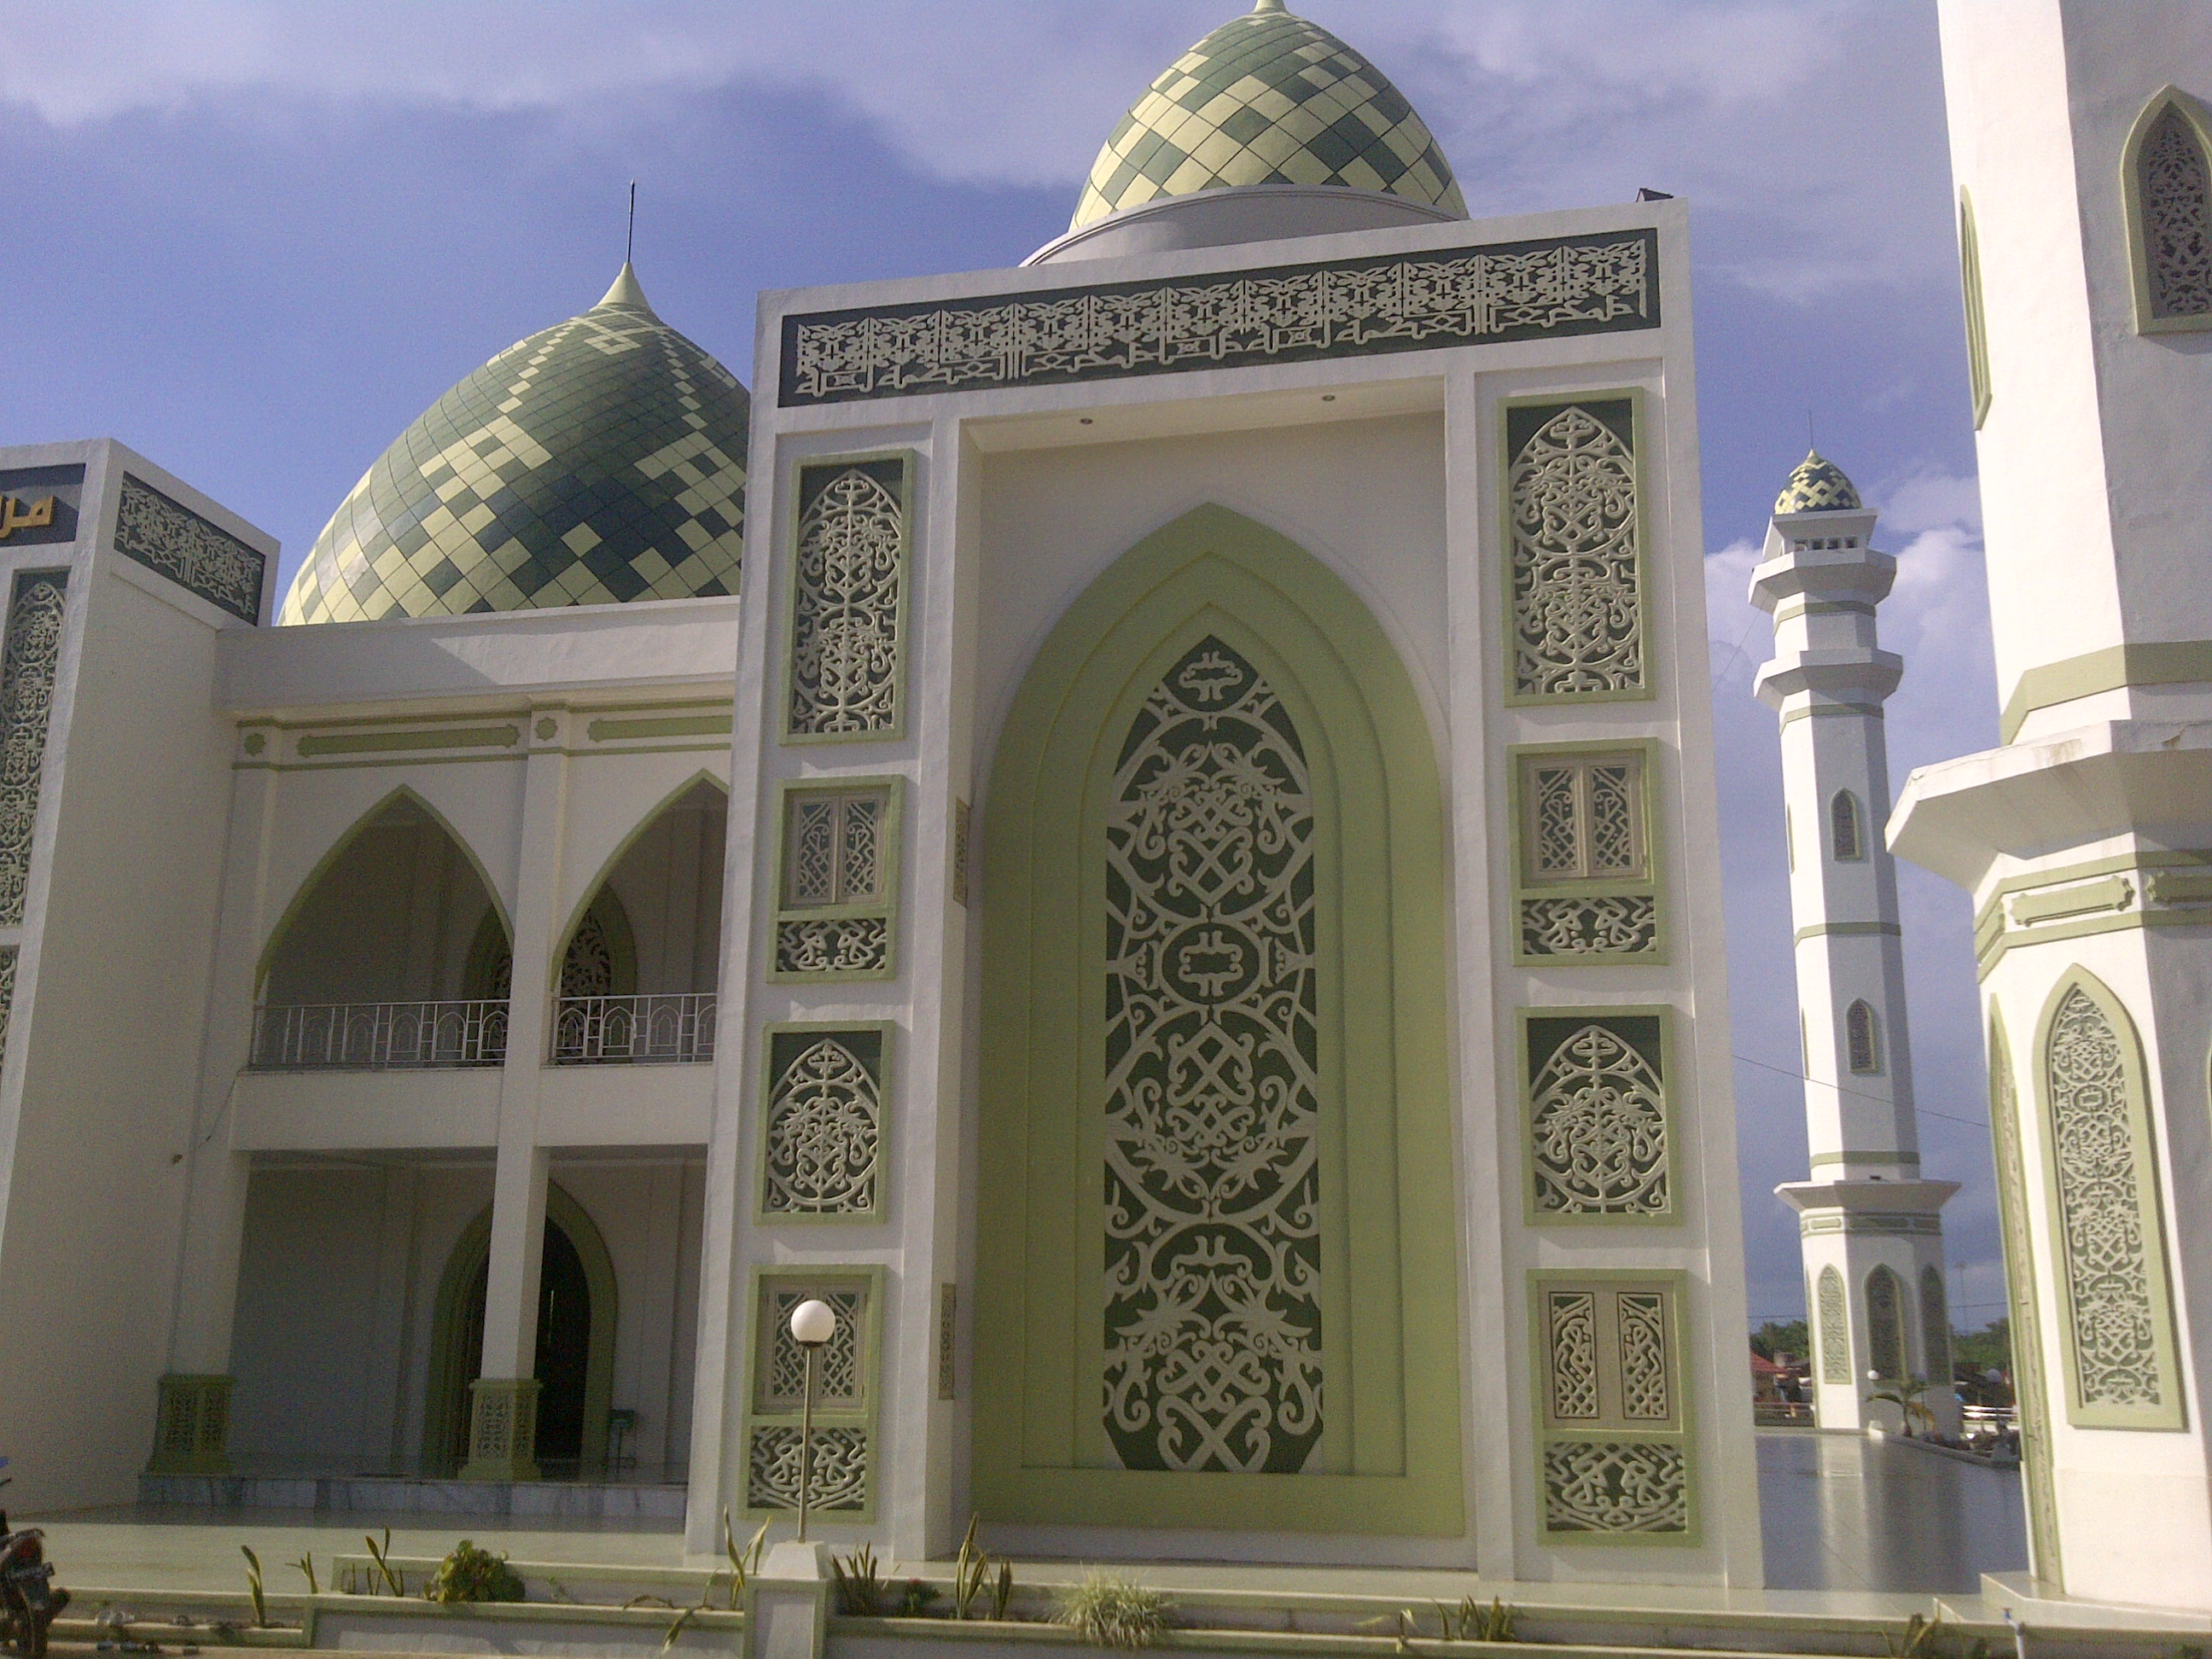 Great mosque, Architecture, Building, Construction, Mosque, HQ Photo